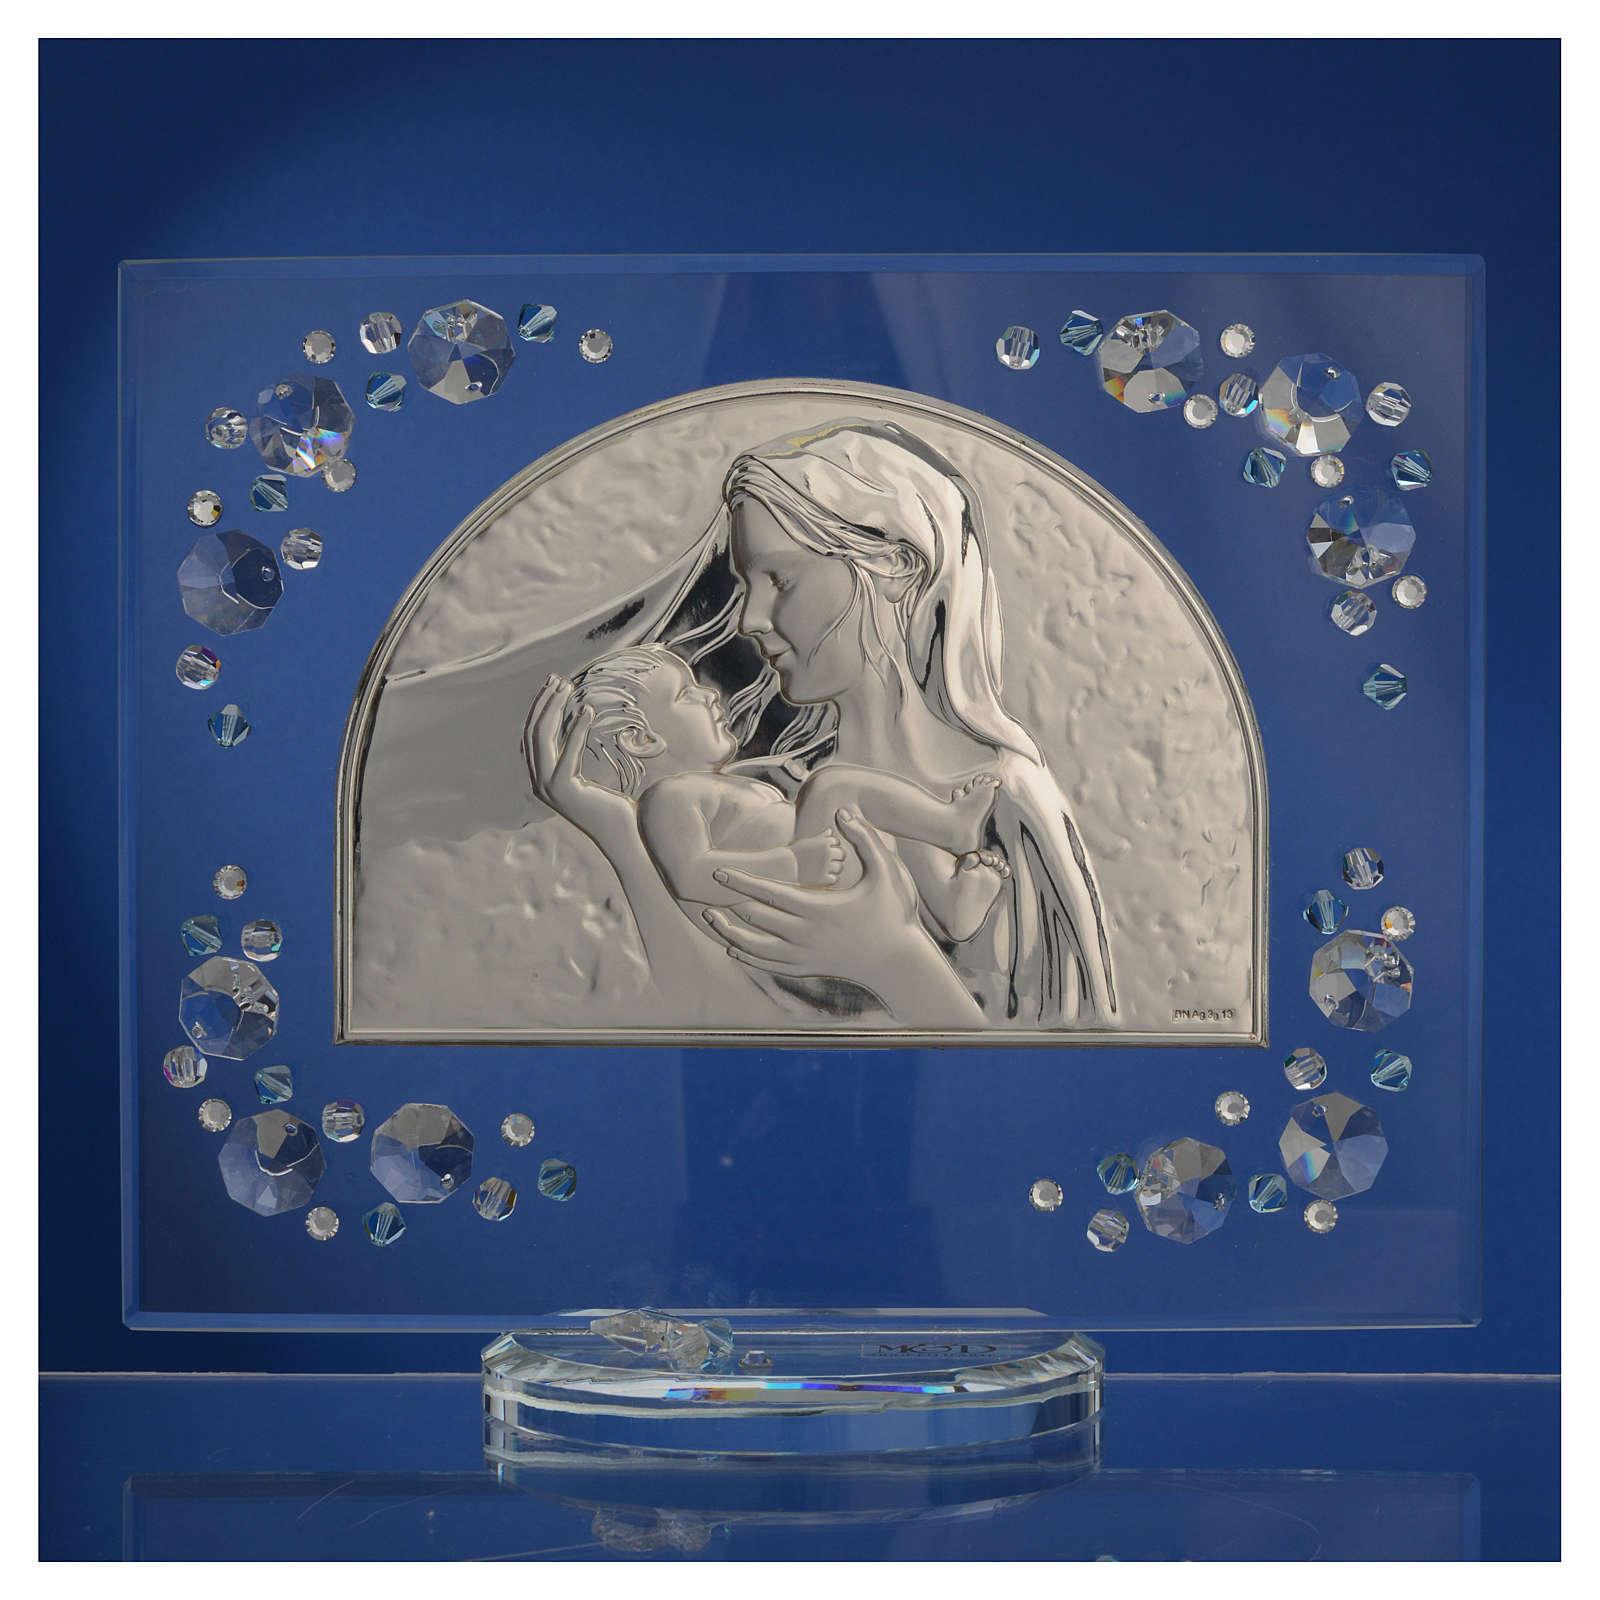 Quadro arco immagine Maternità Swarovski acquamarina 3